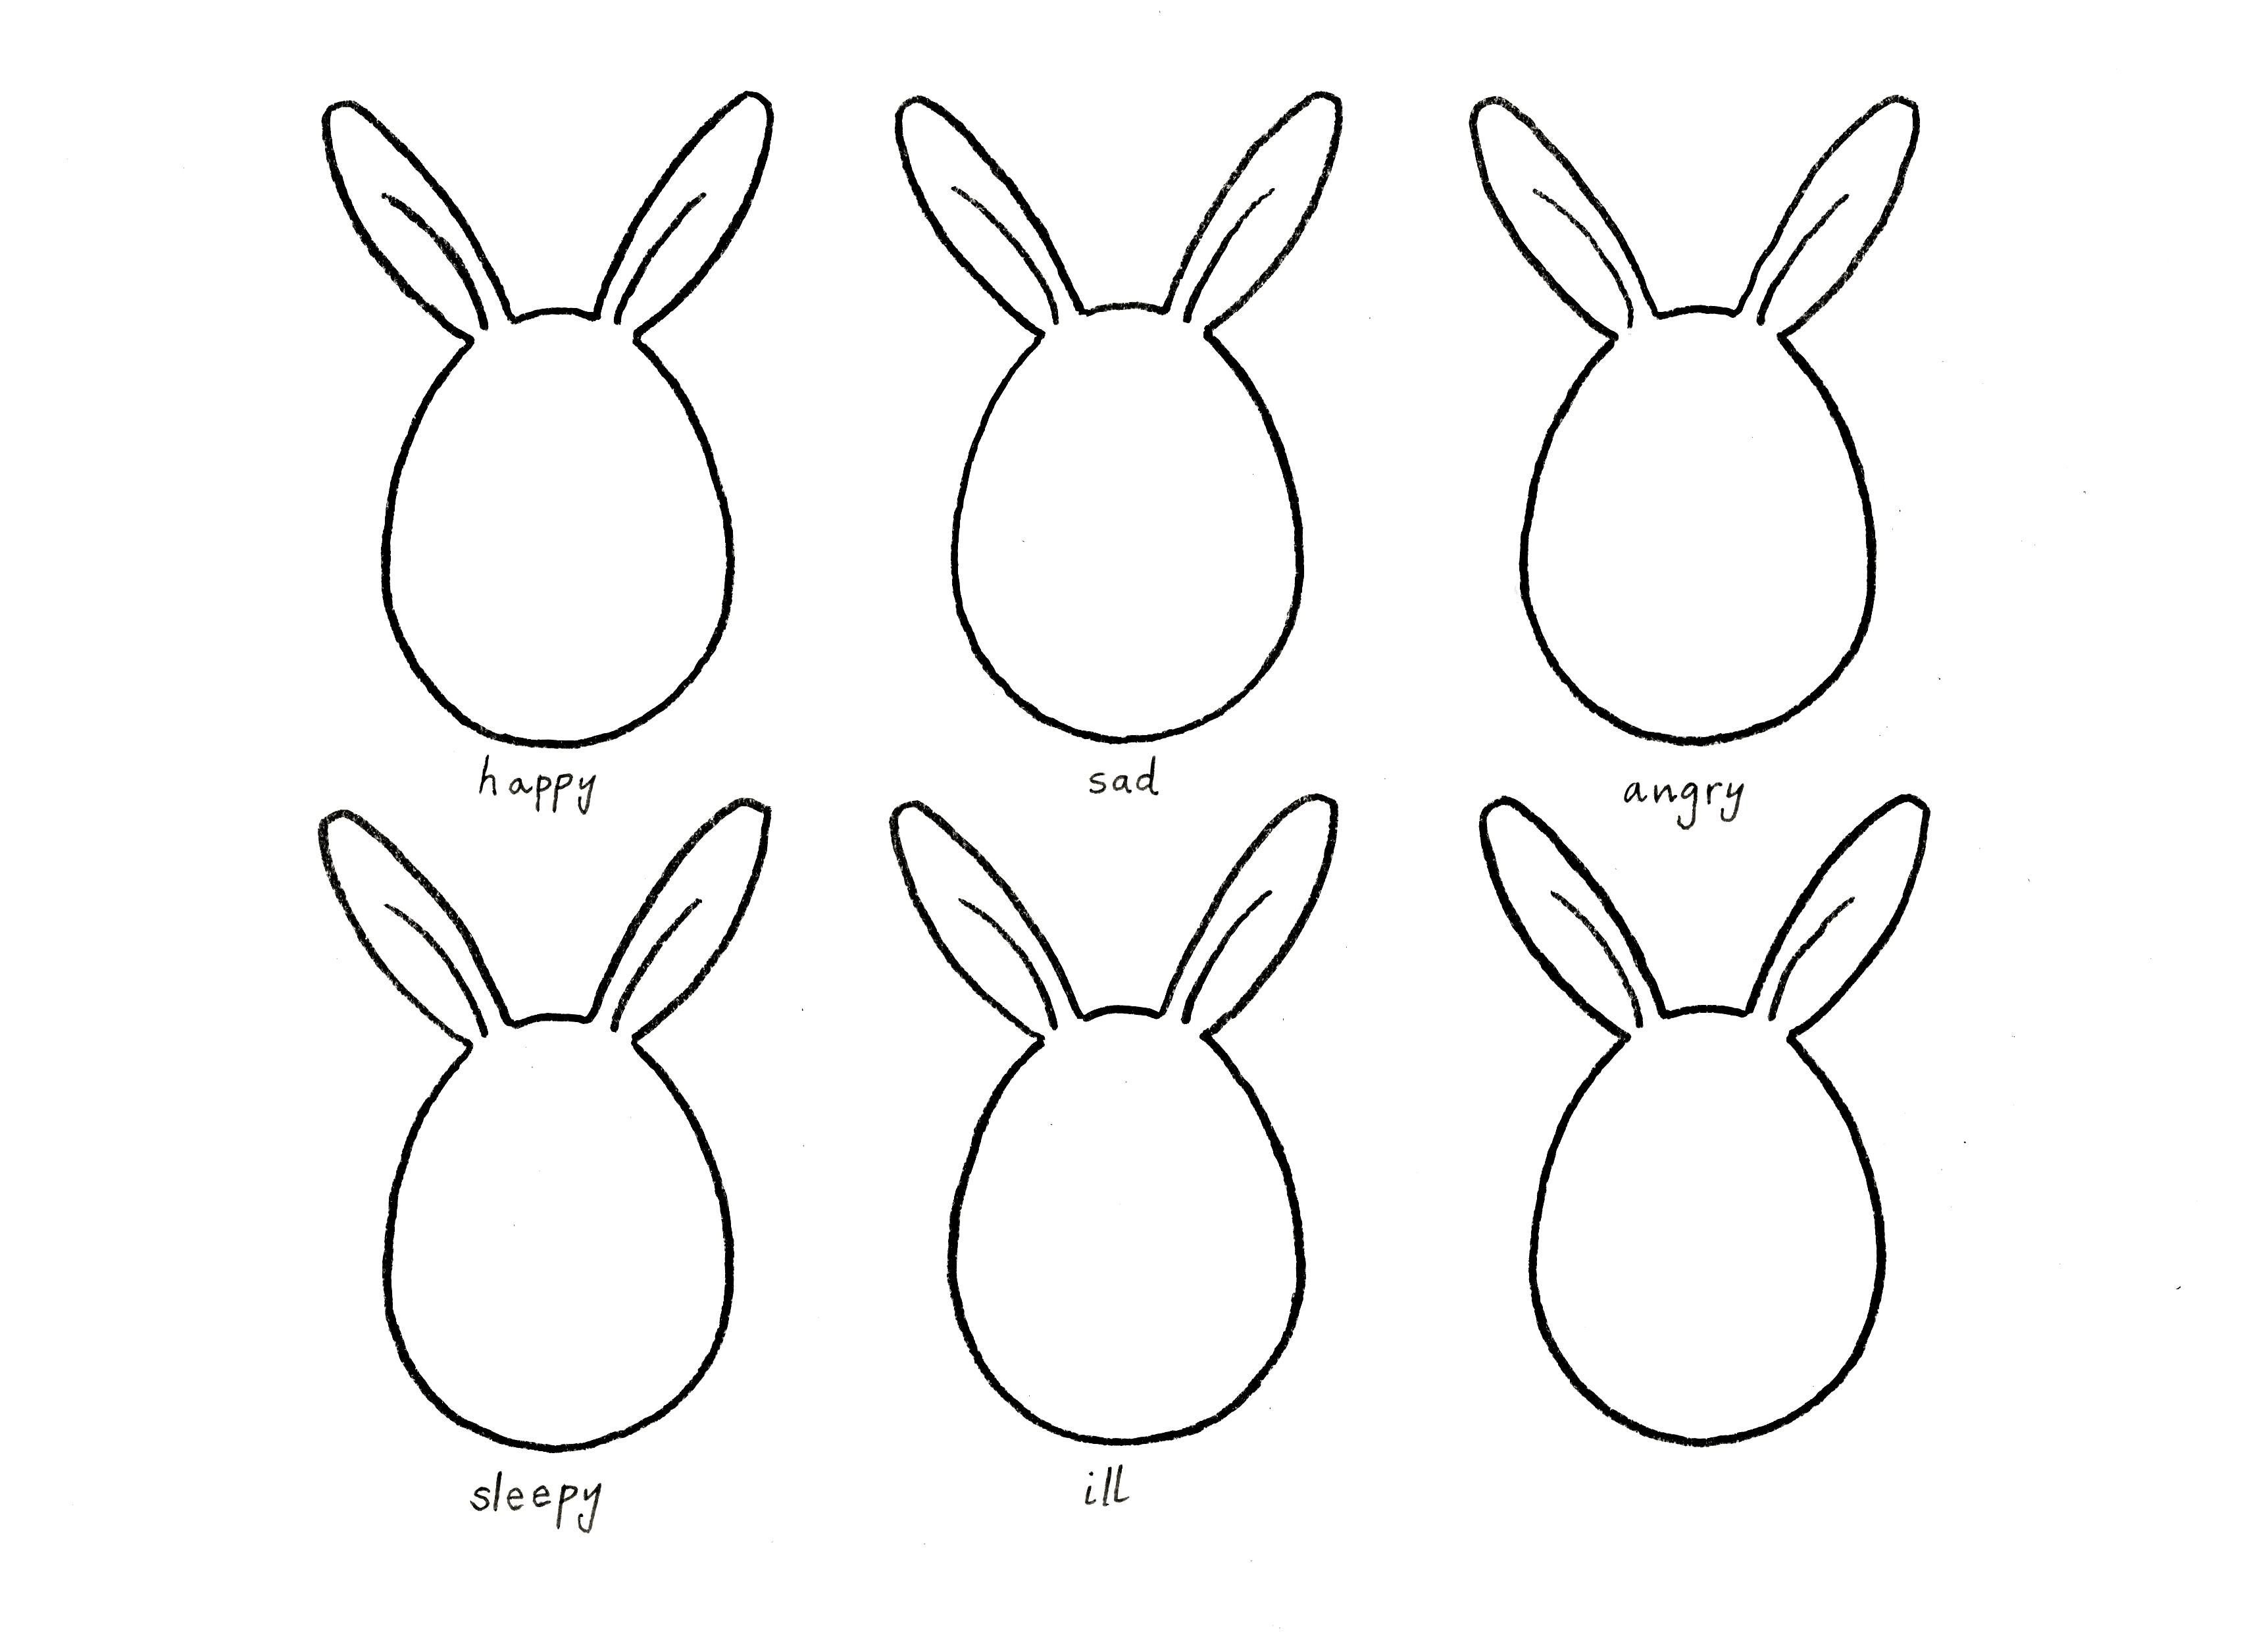 Marthas Bunny Faces Drawing Game Jpeg 3447x2498 Small Bunny Drawings